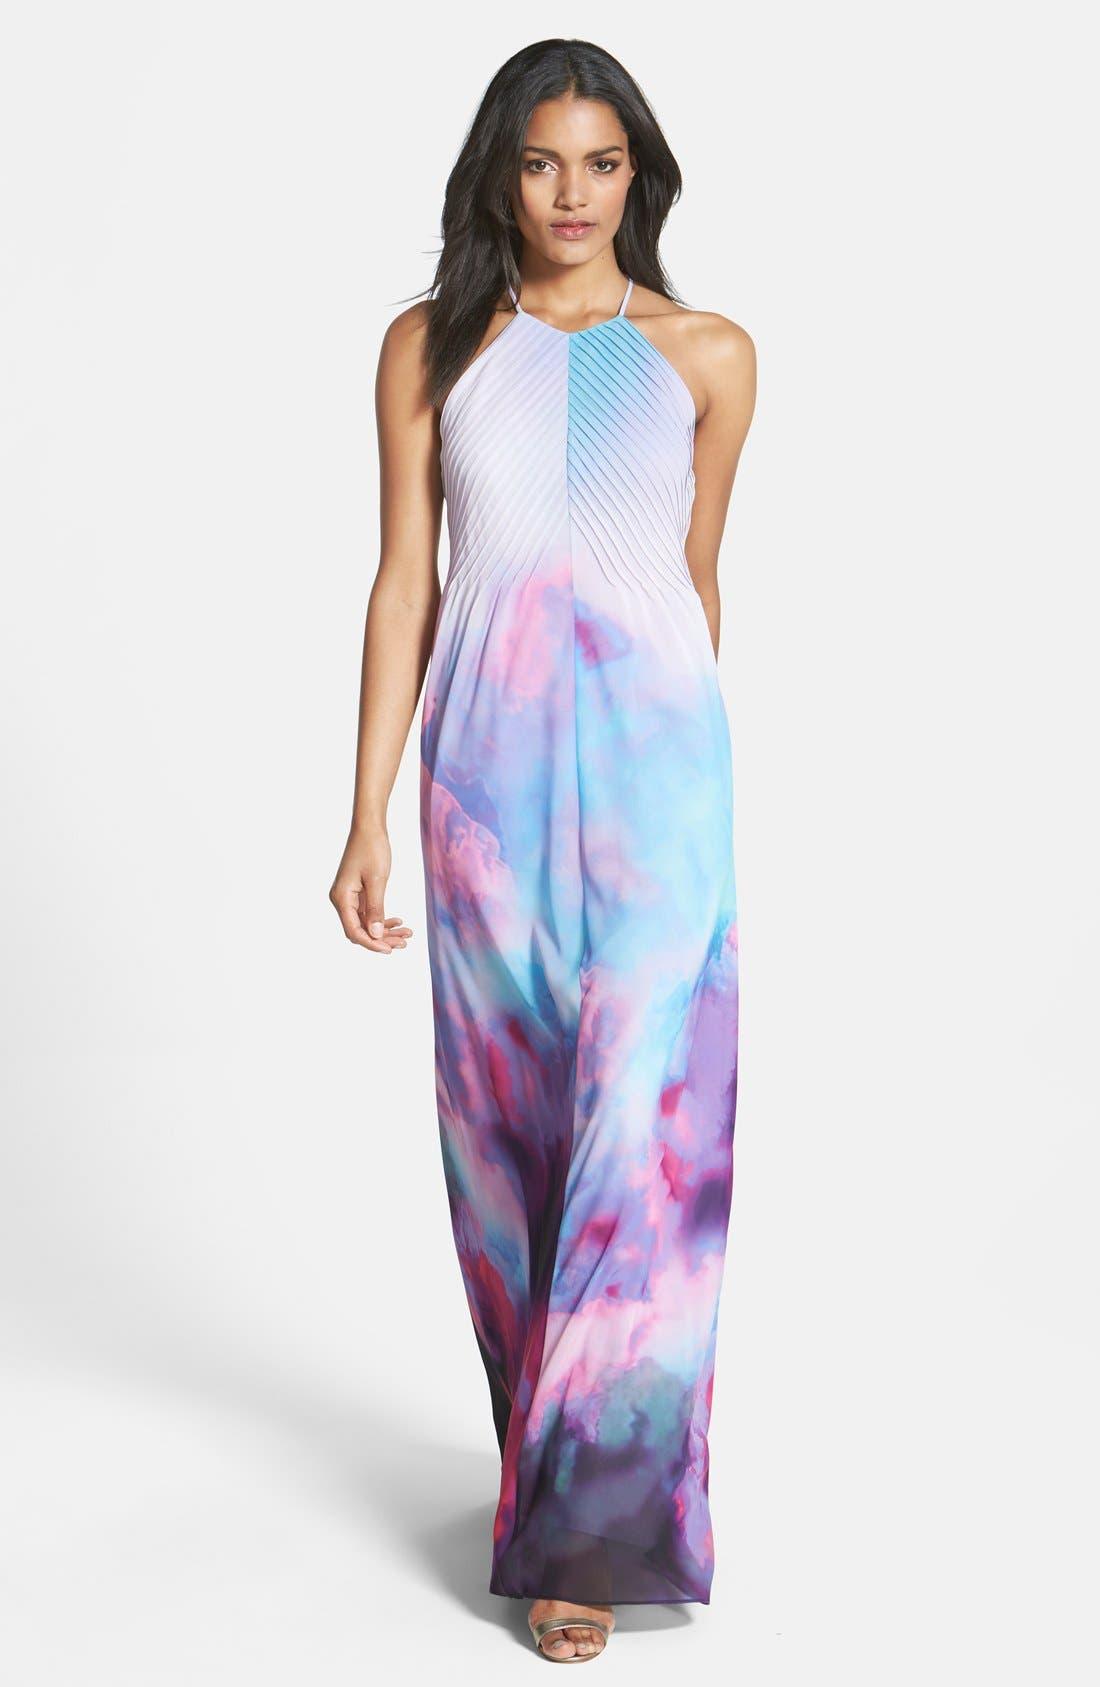 Alternate Image 1 Selected - Ted Baker London 'Summer at Dusk' Print Maxi Dress